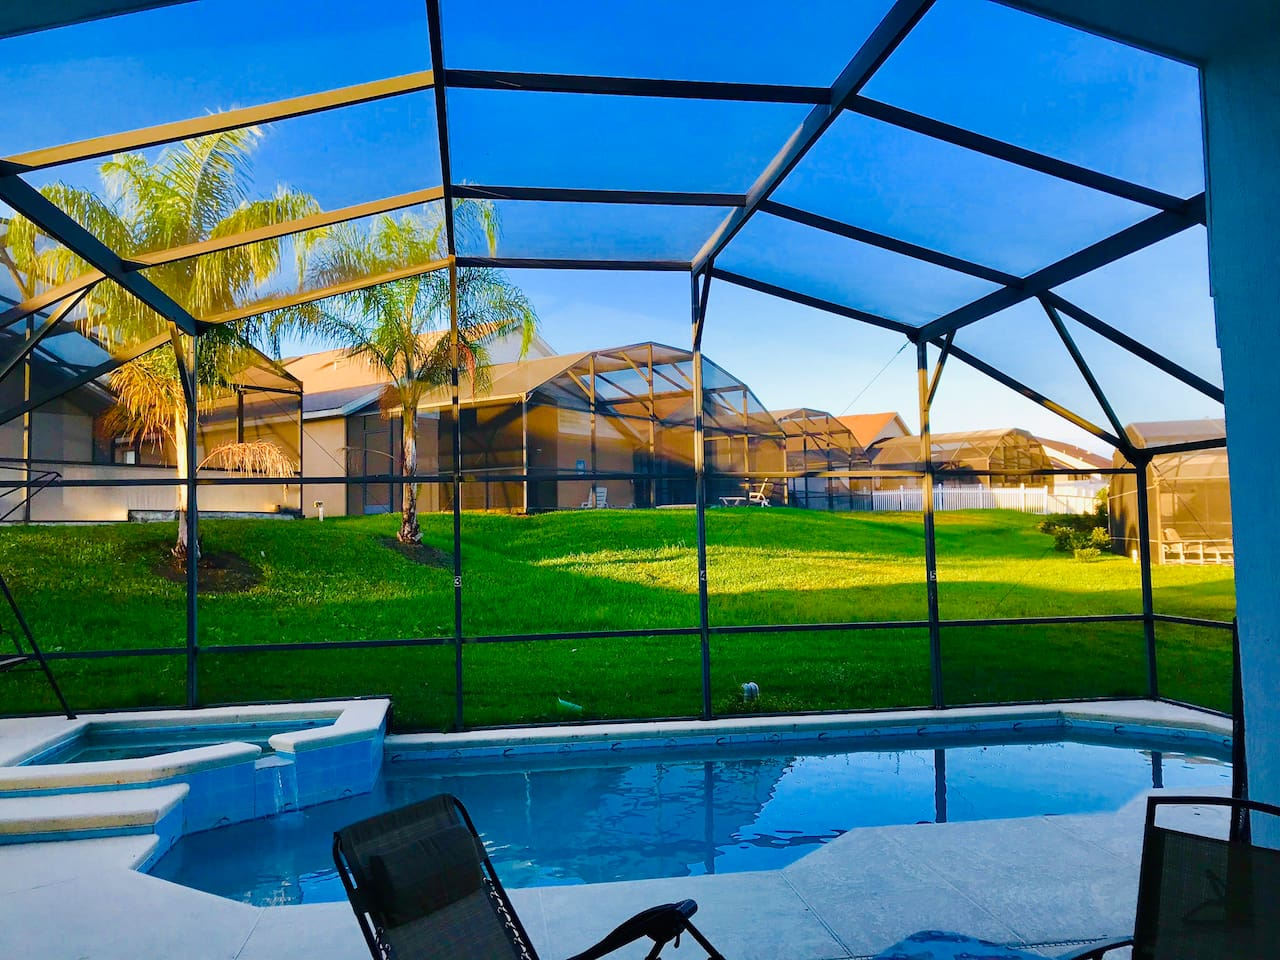 Swimming Pool, Spa and Backyard